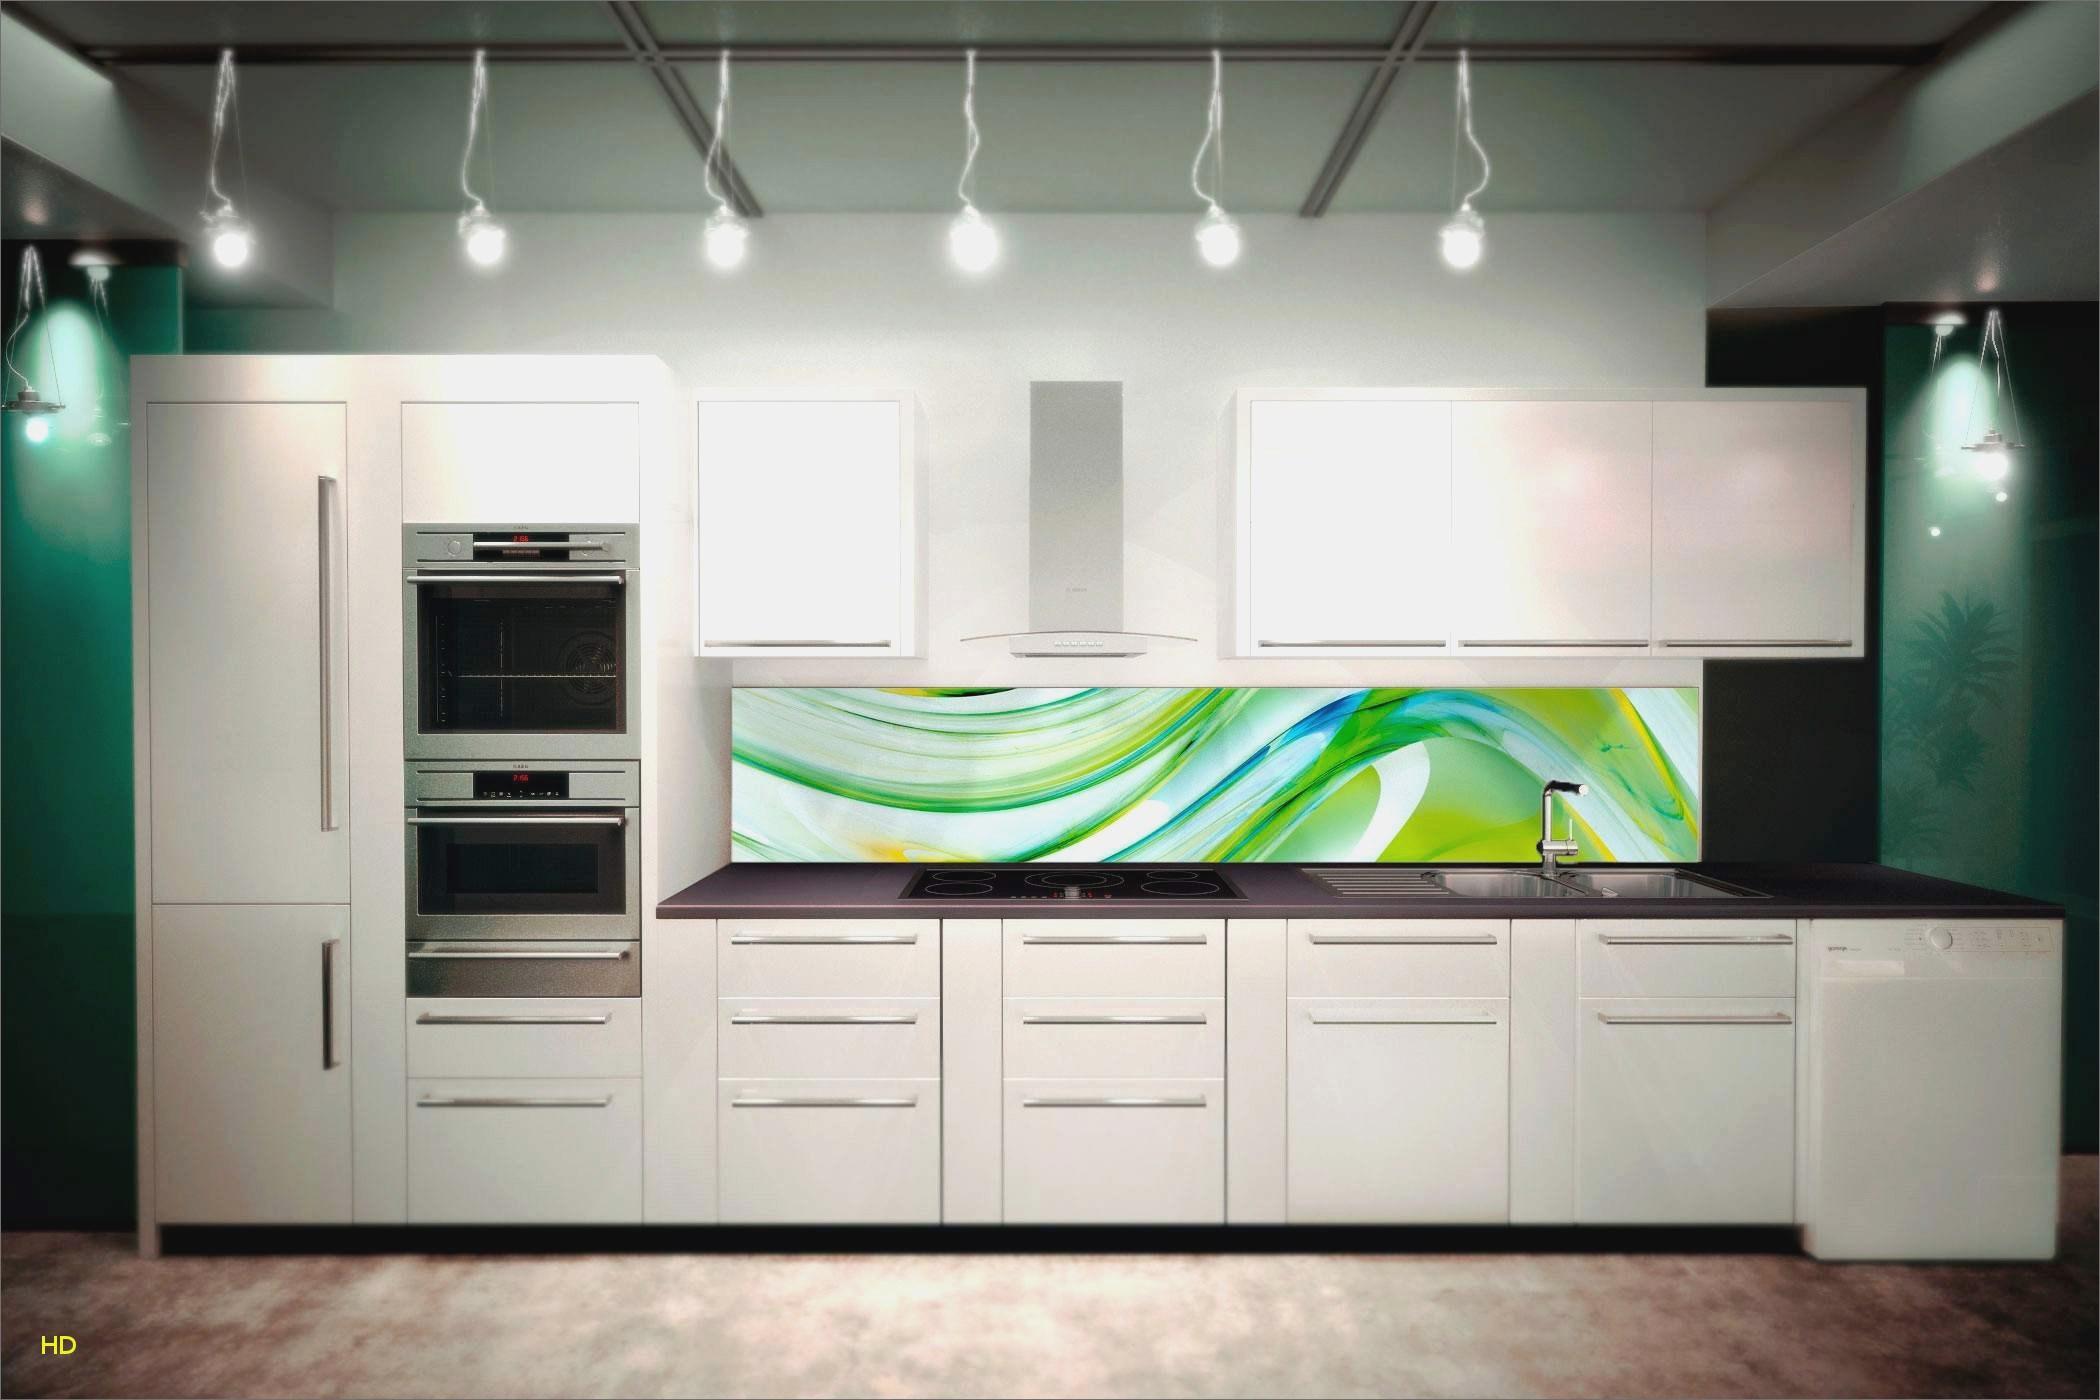 Carrelage Mural Cuisine Ikea credence verre ikea – gamboahinestrosa